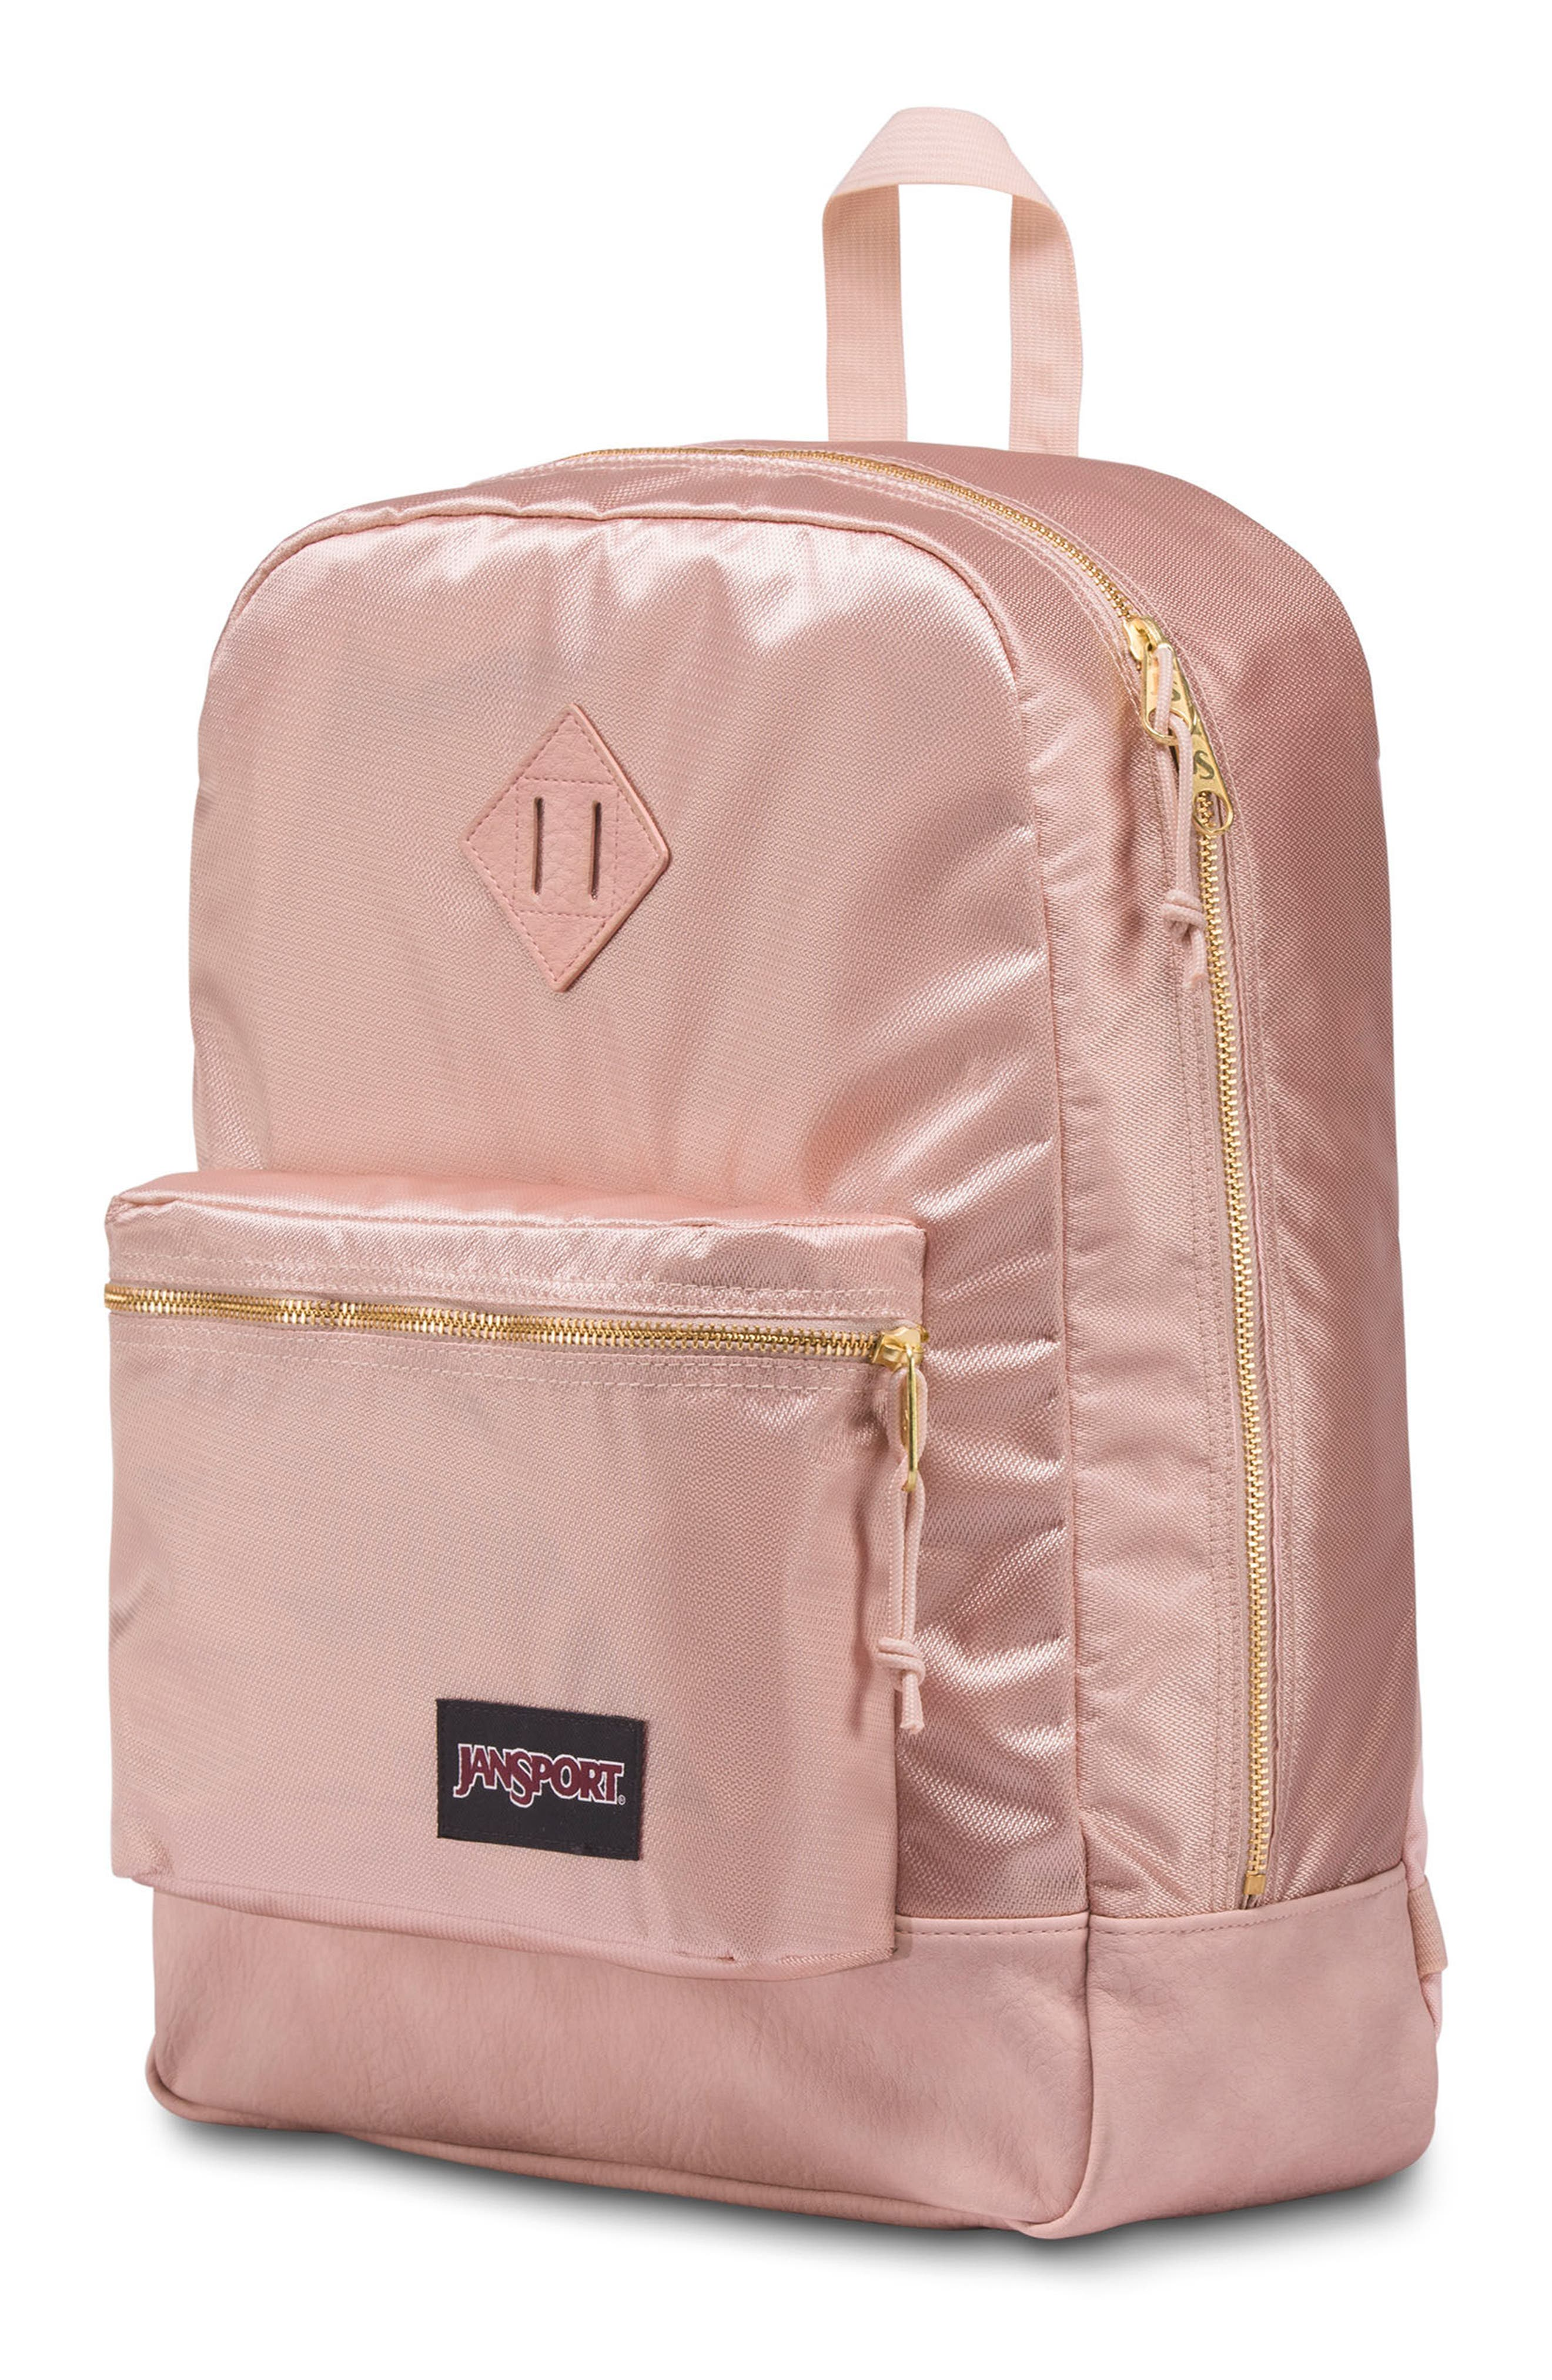 Super FX Gym Backpack,                             Alternate thumbnail 3, color,                             ROSE SMOKE GOLD